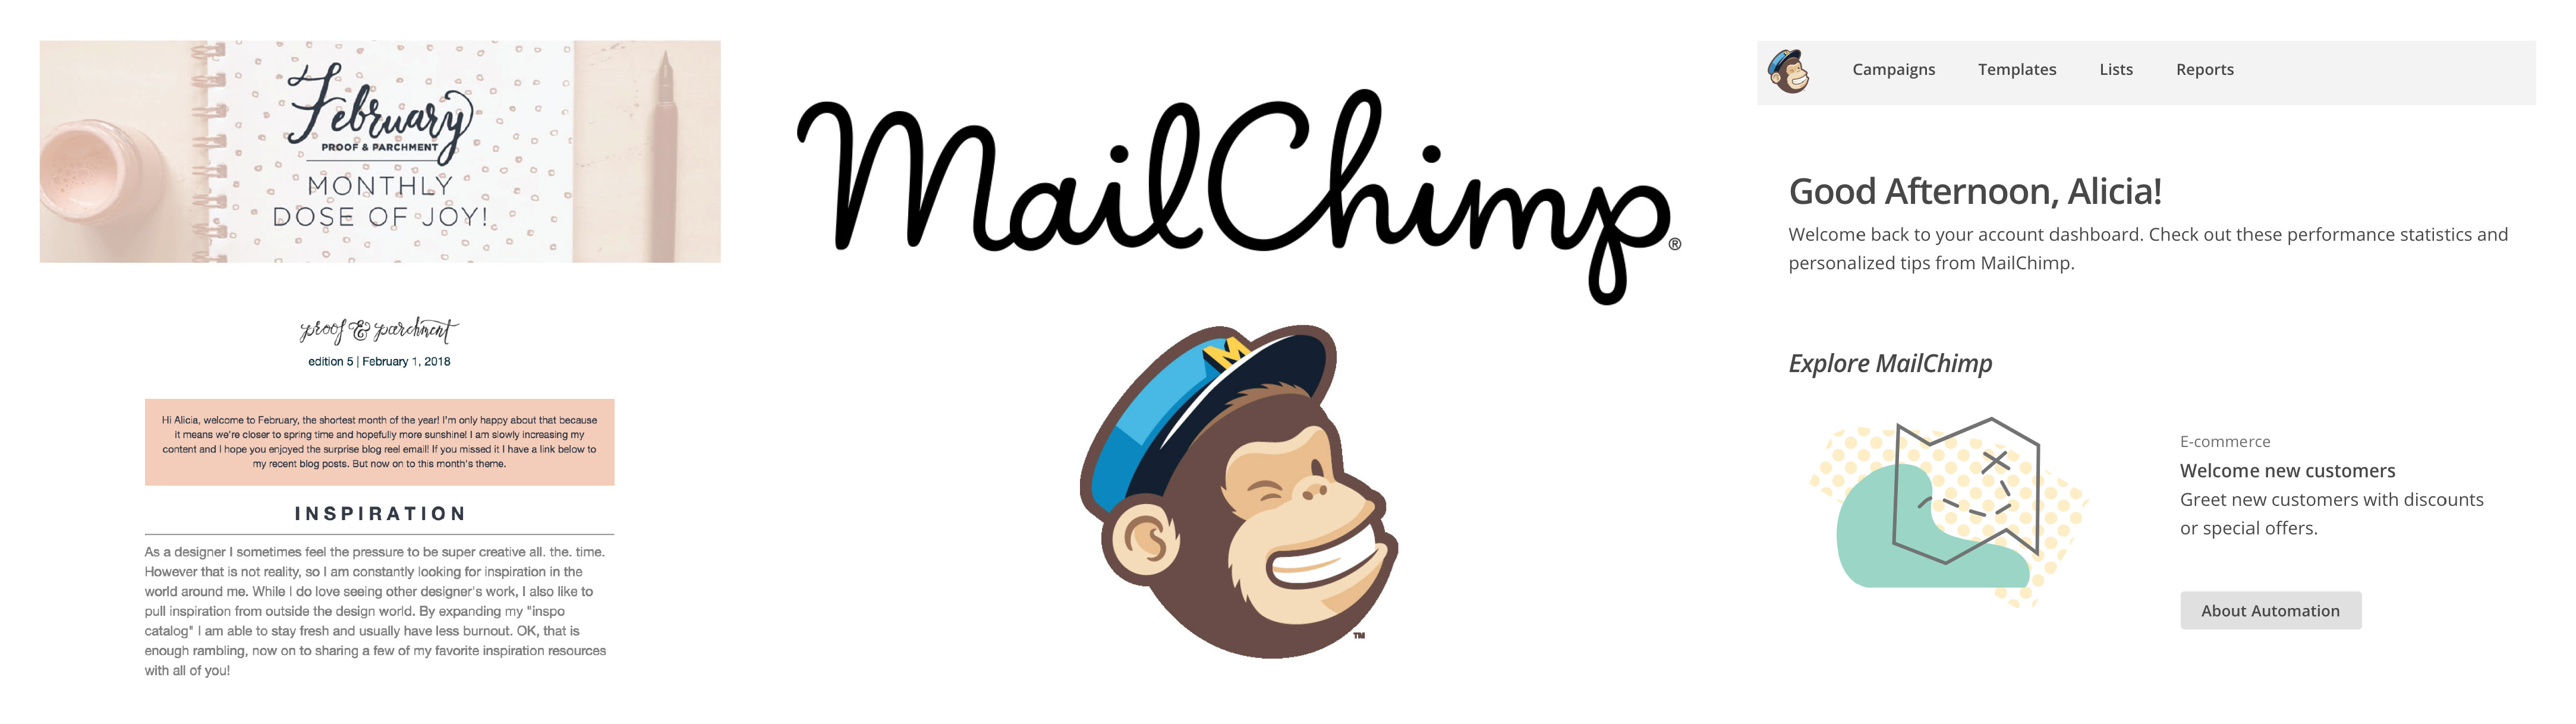 Business tool screenshots from MailChimp